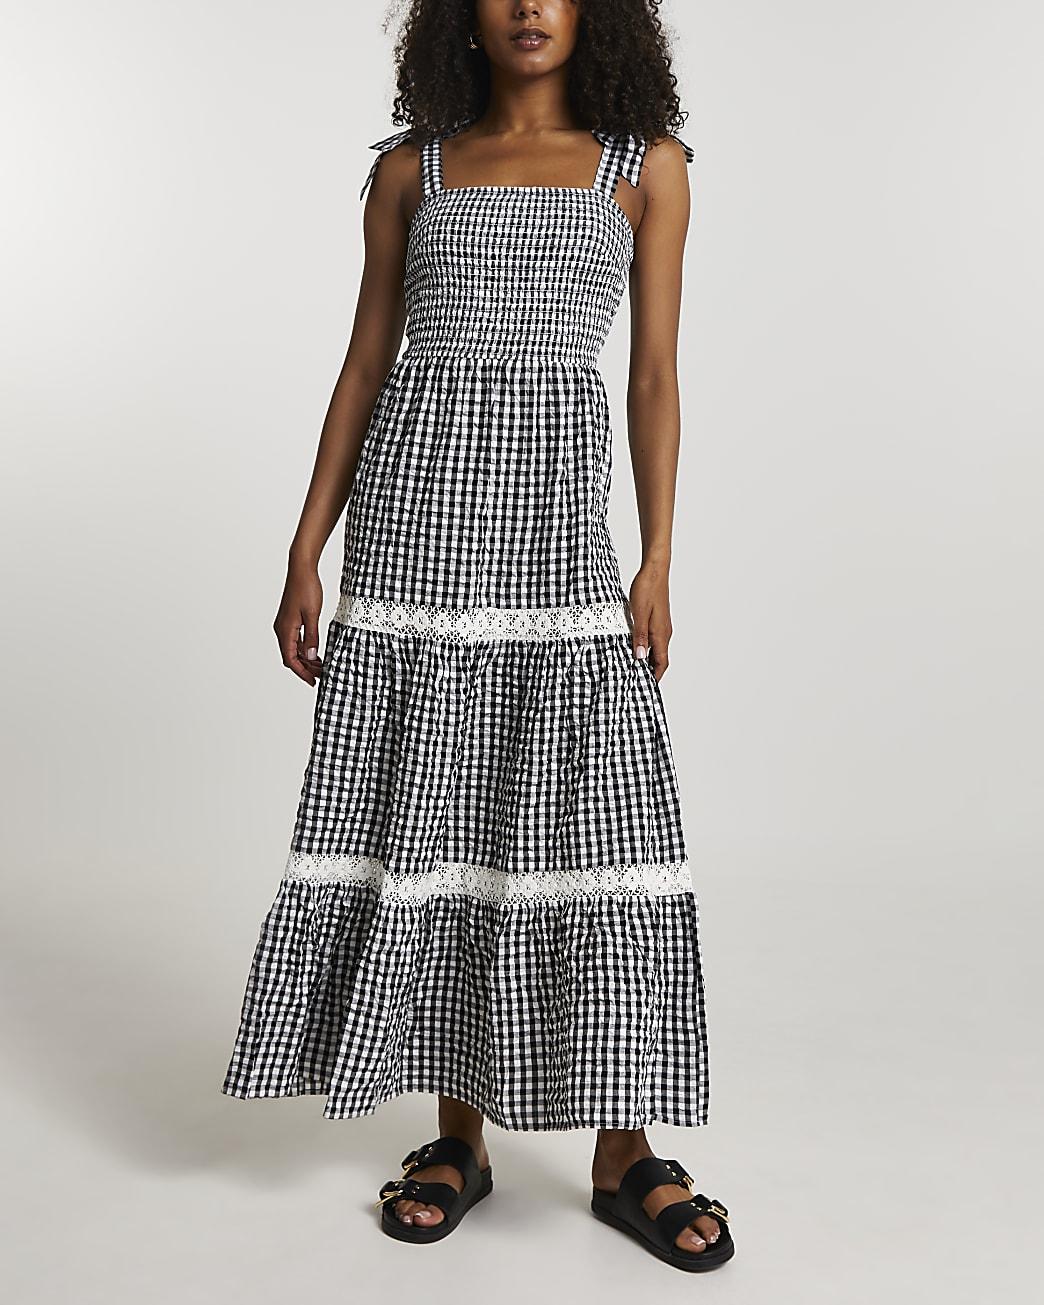 Black gingham maxi dress